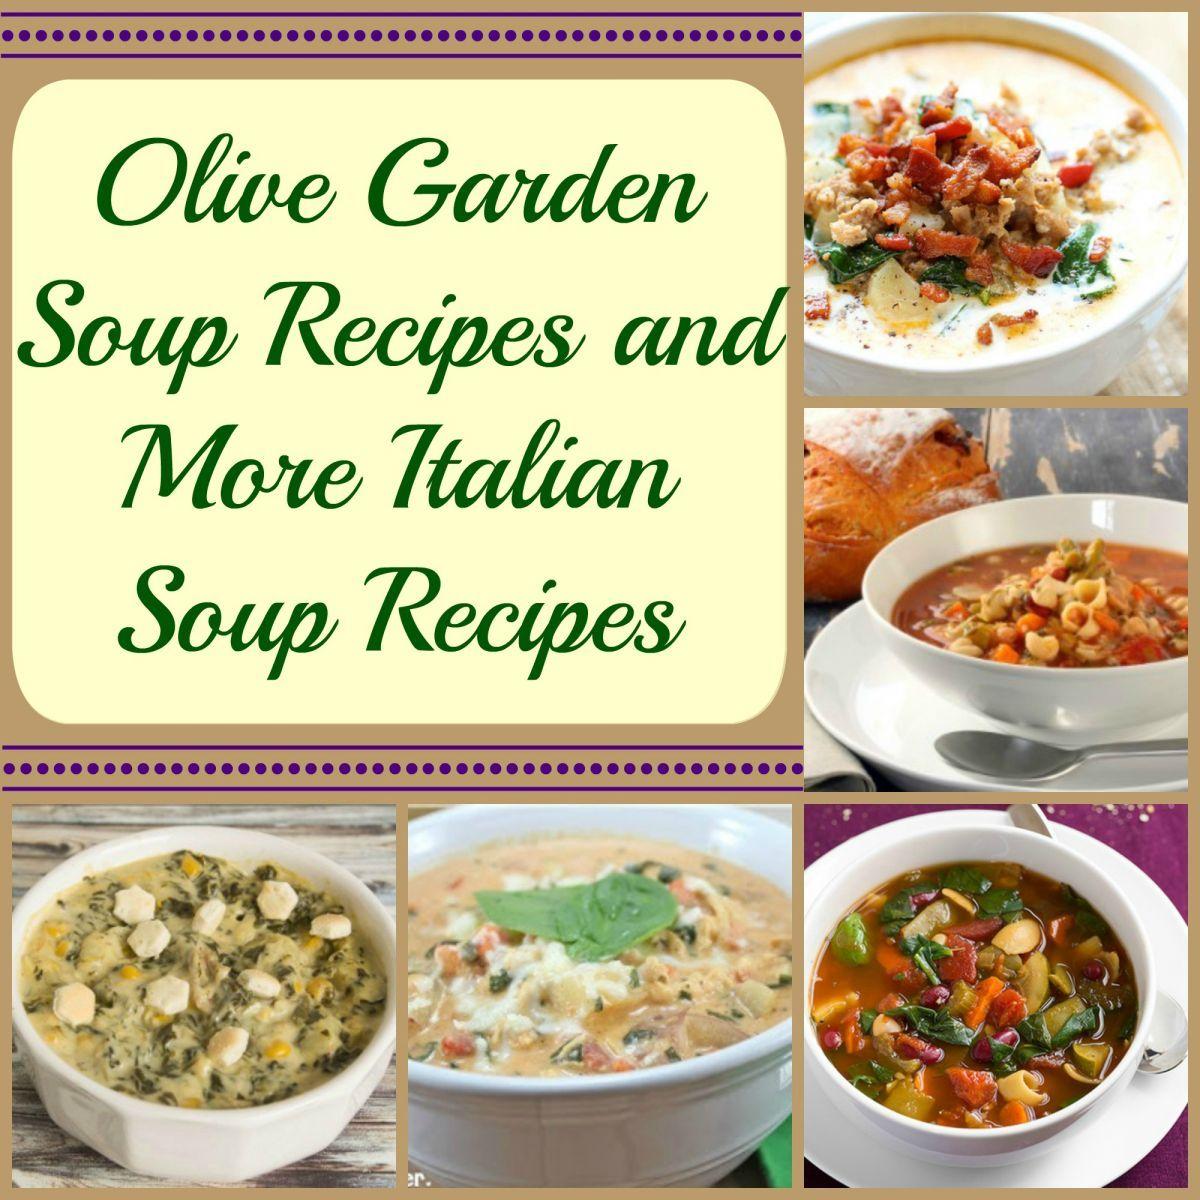 11 Olive Garden Soup Recipes Food Recipes Italian Recipes Soup